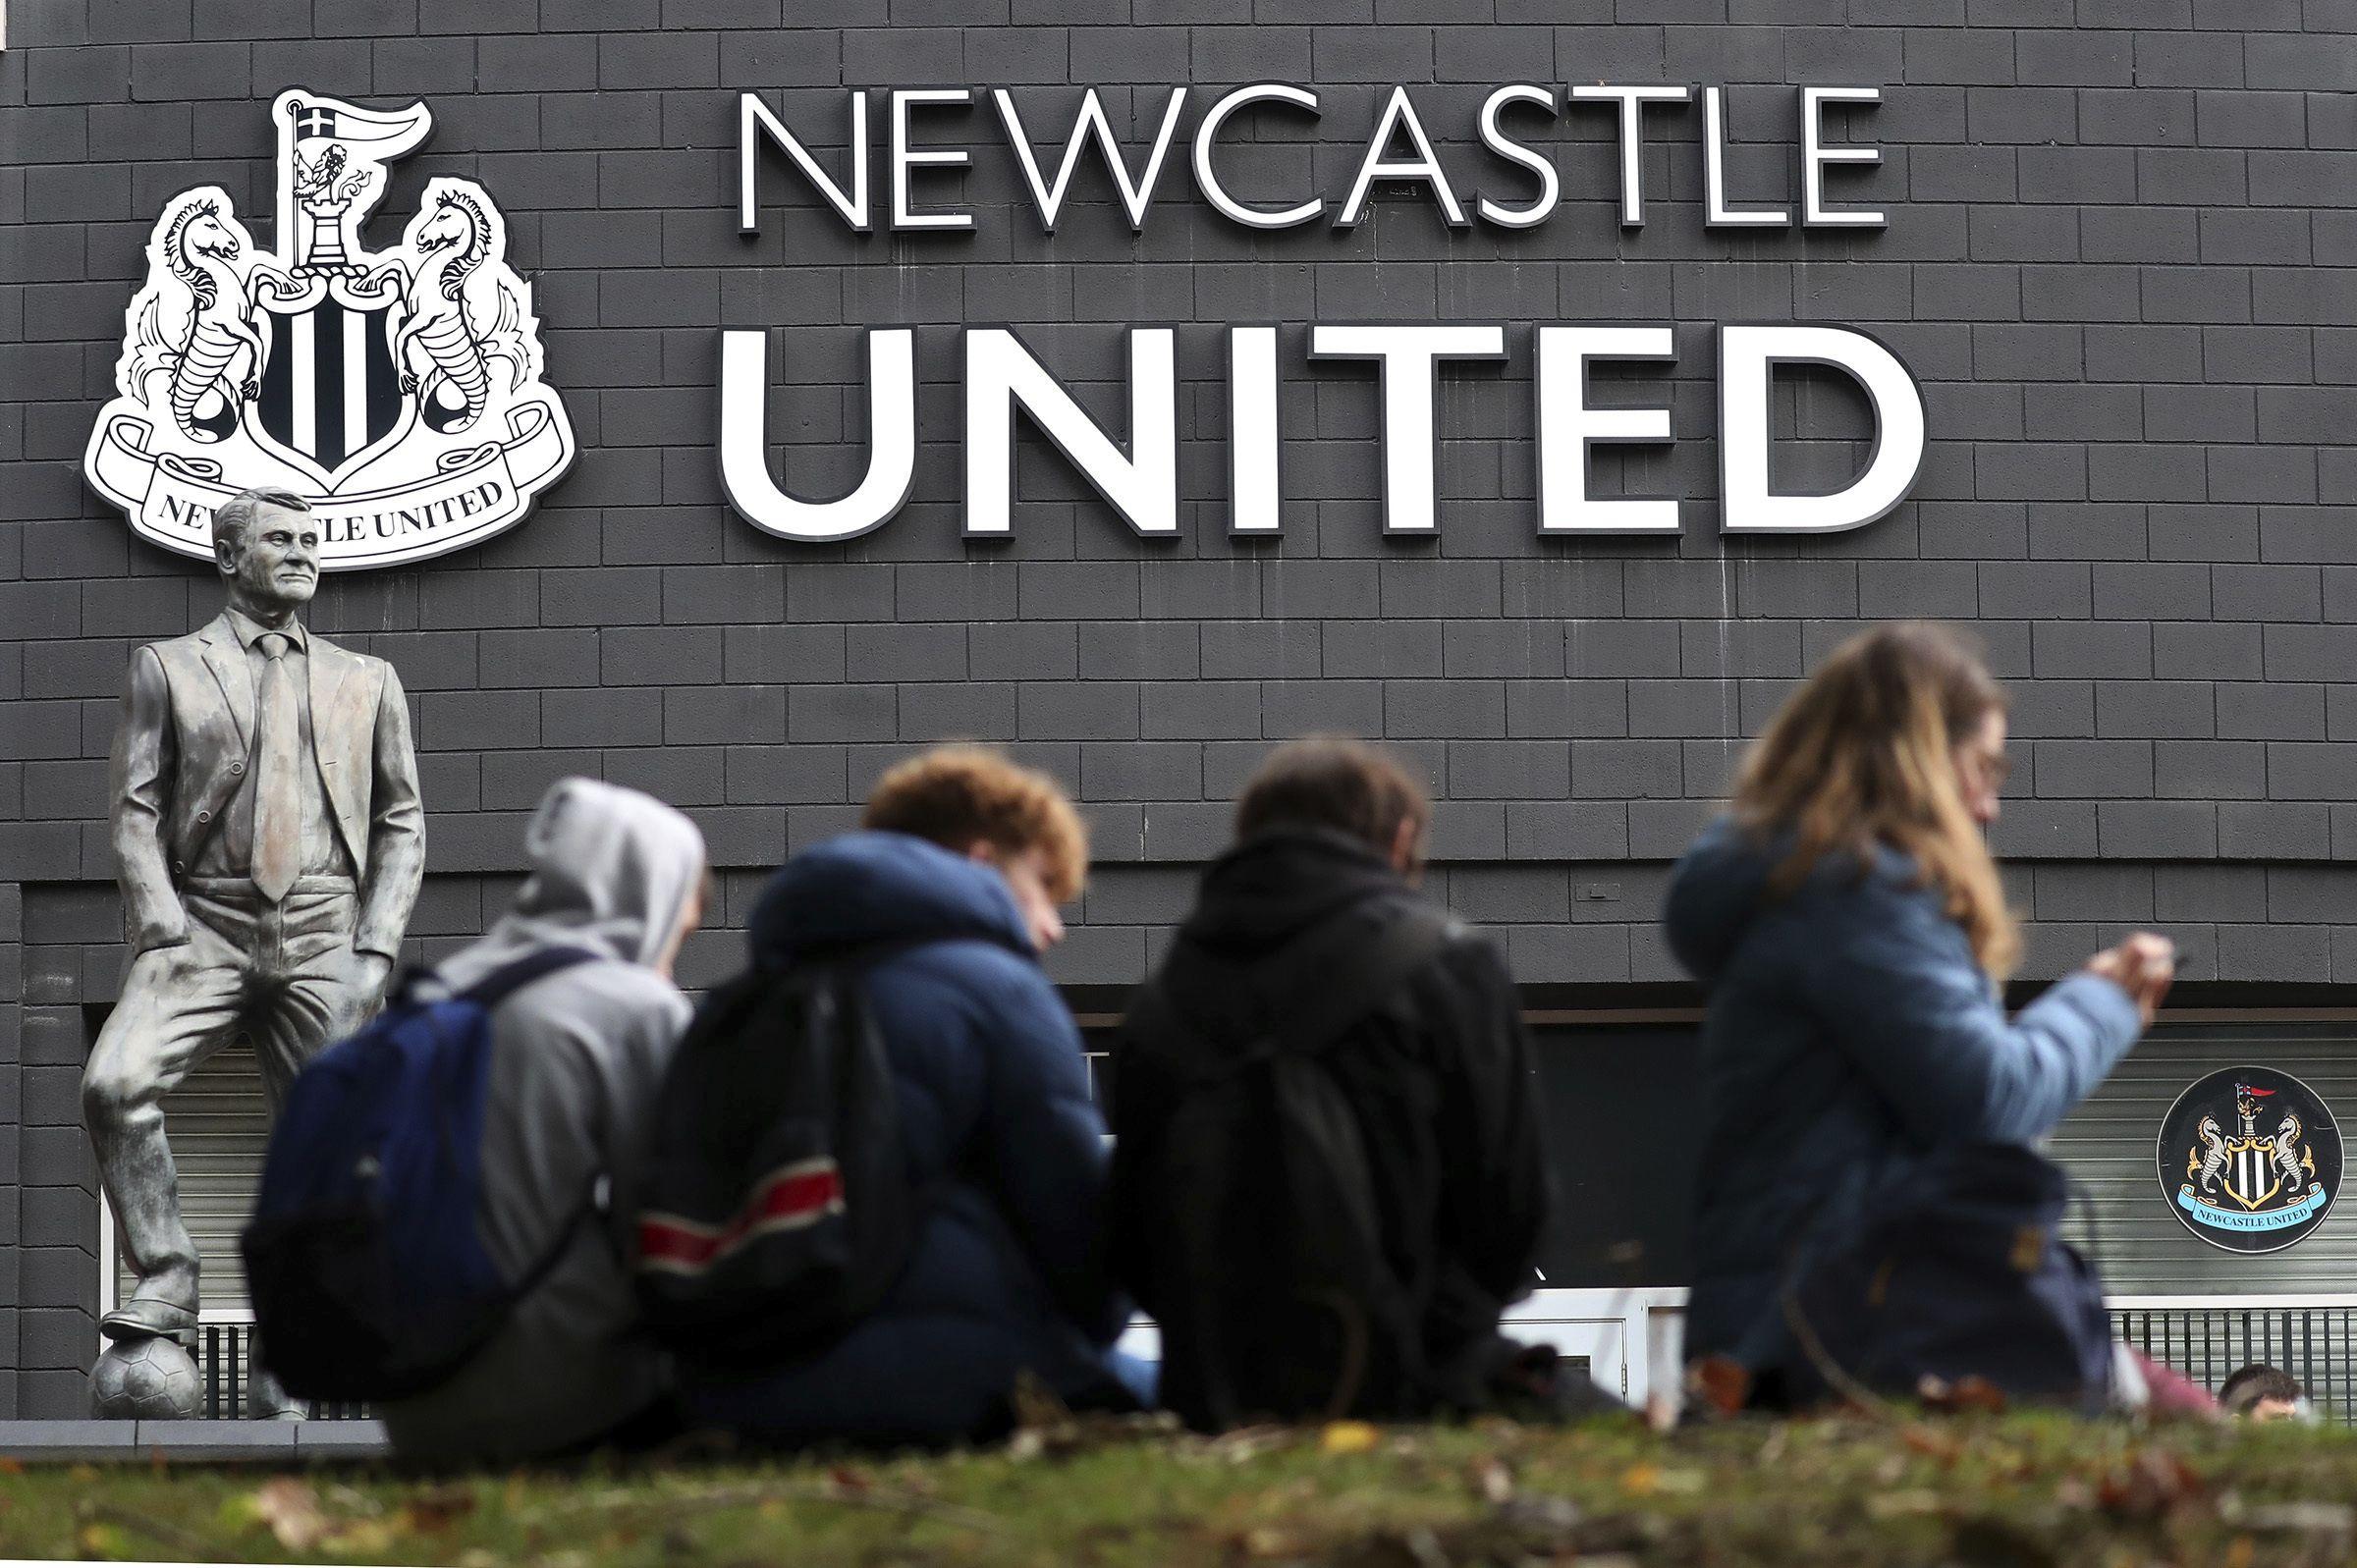 Fondo soberano saudí compra al Newcastle